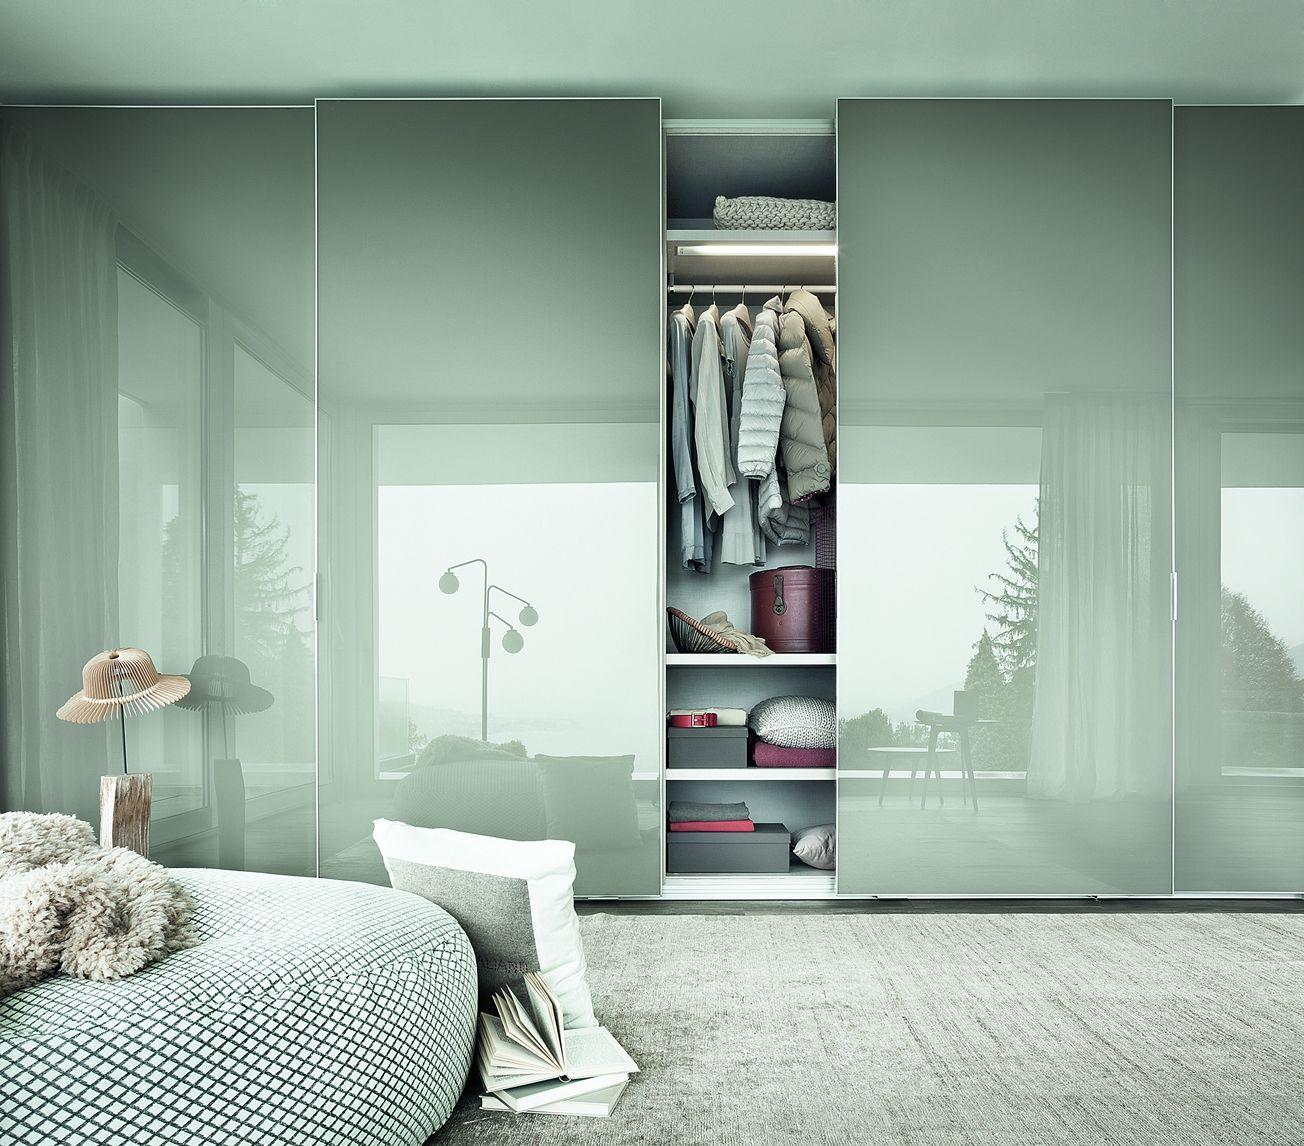 Cheap Bedroom Design Ideas Sliding Door Wardrobes: Bedroom Closet Design, Wardrobe